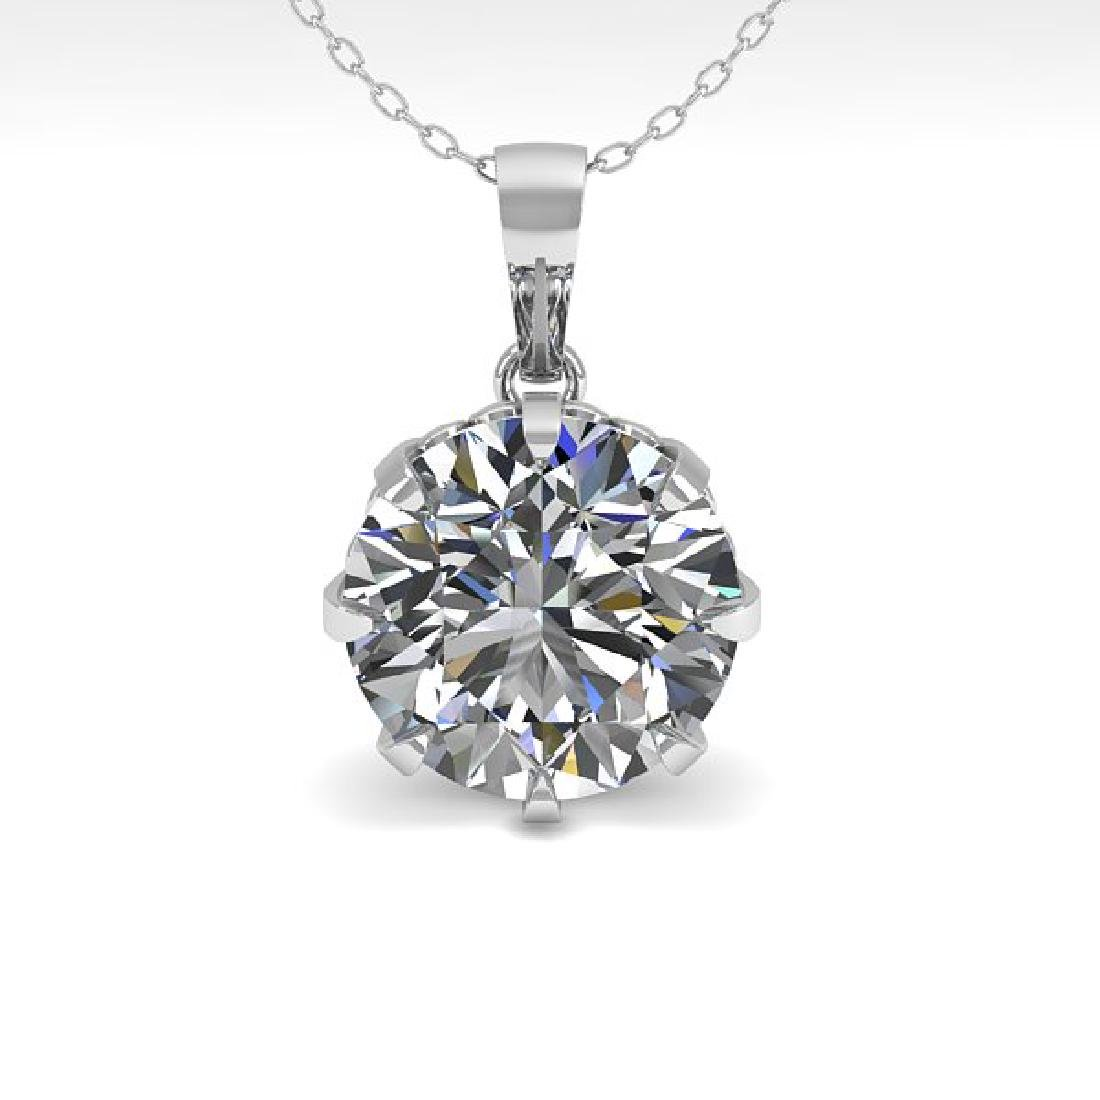 1 CTW VS/SI Diamond Solitaire Necklace 14K White Gold - 2